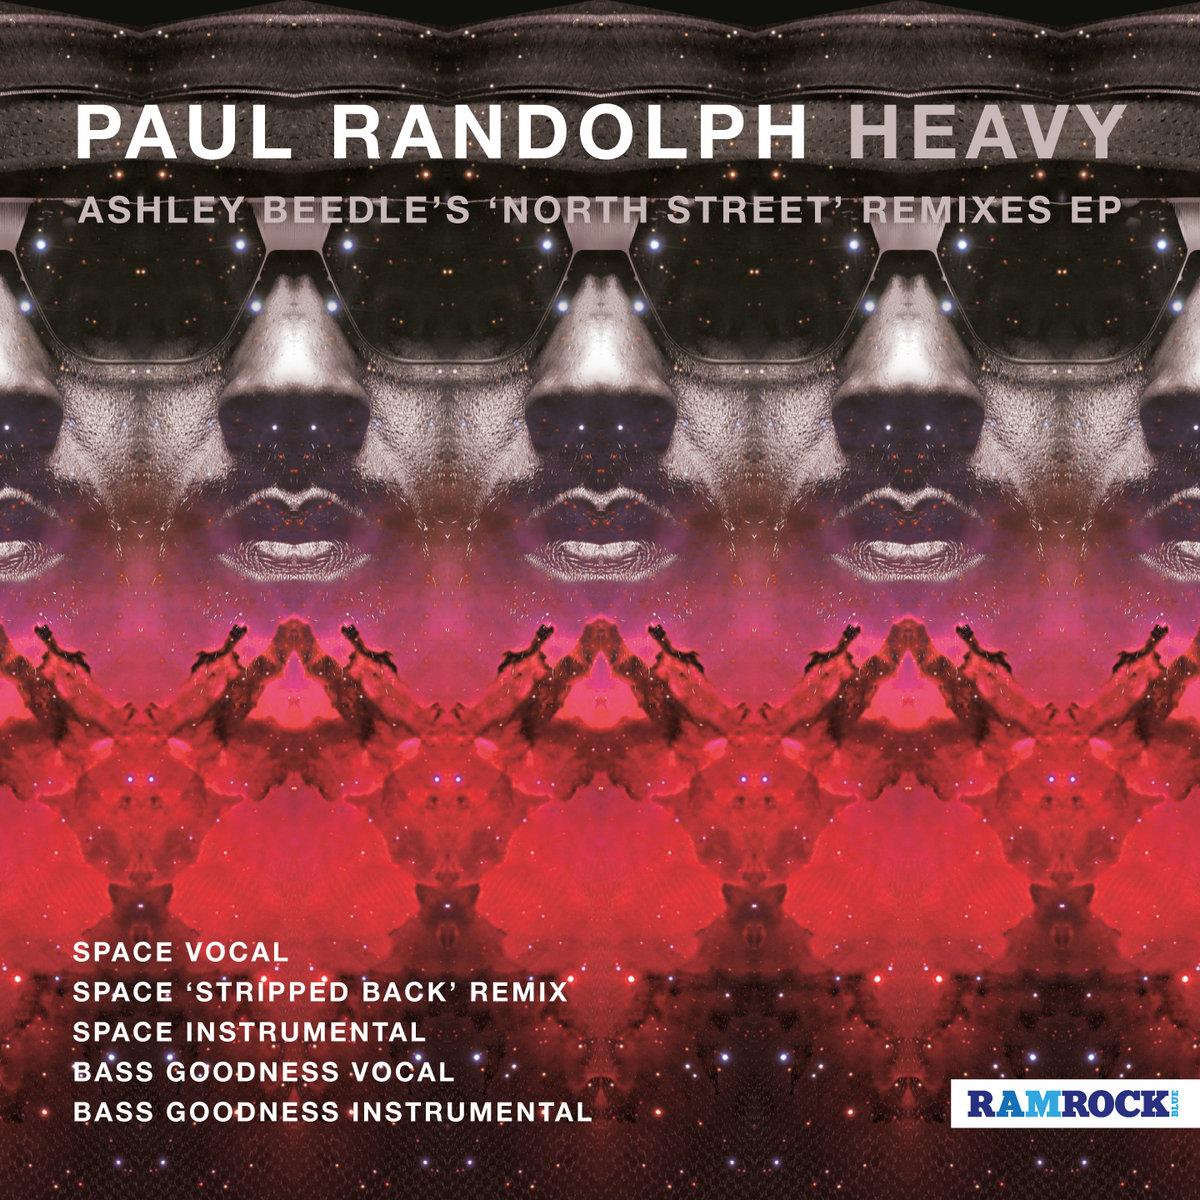 Heavy - Ashley Beedle's 'North Street' Bass Goodness